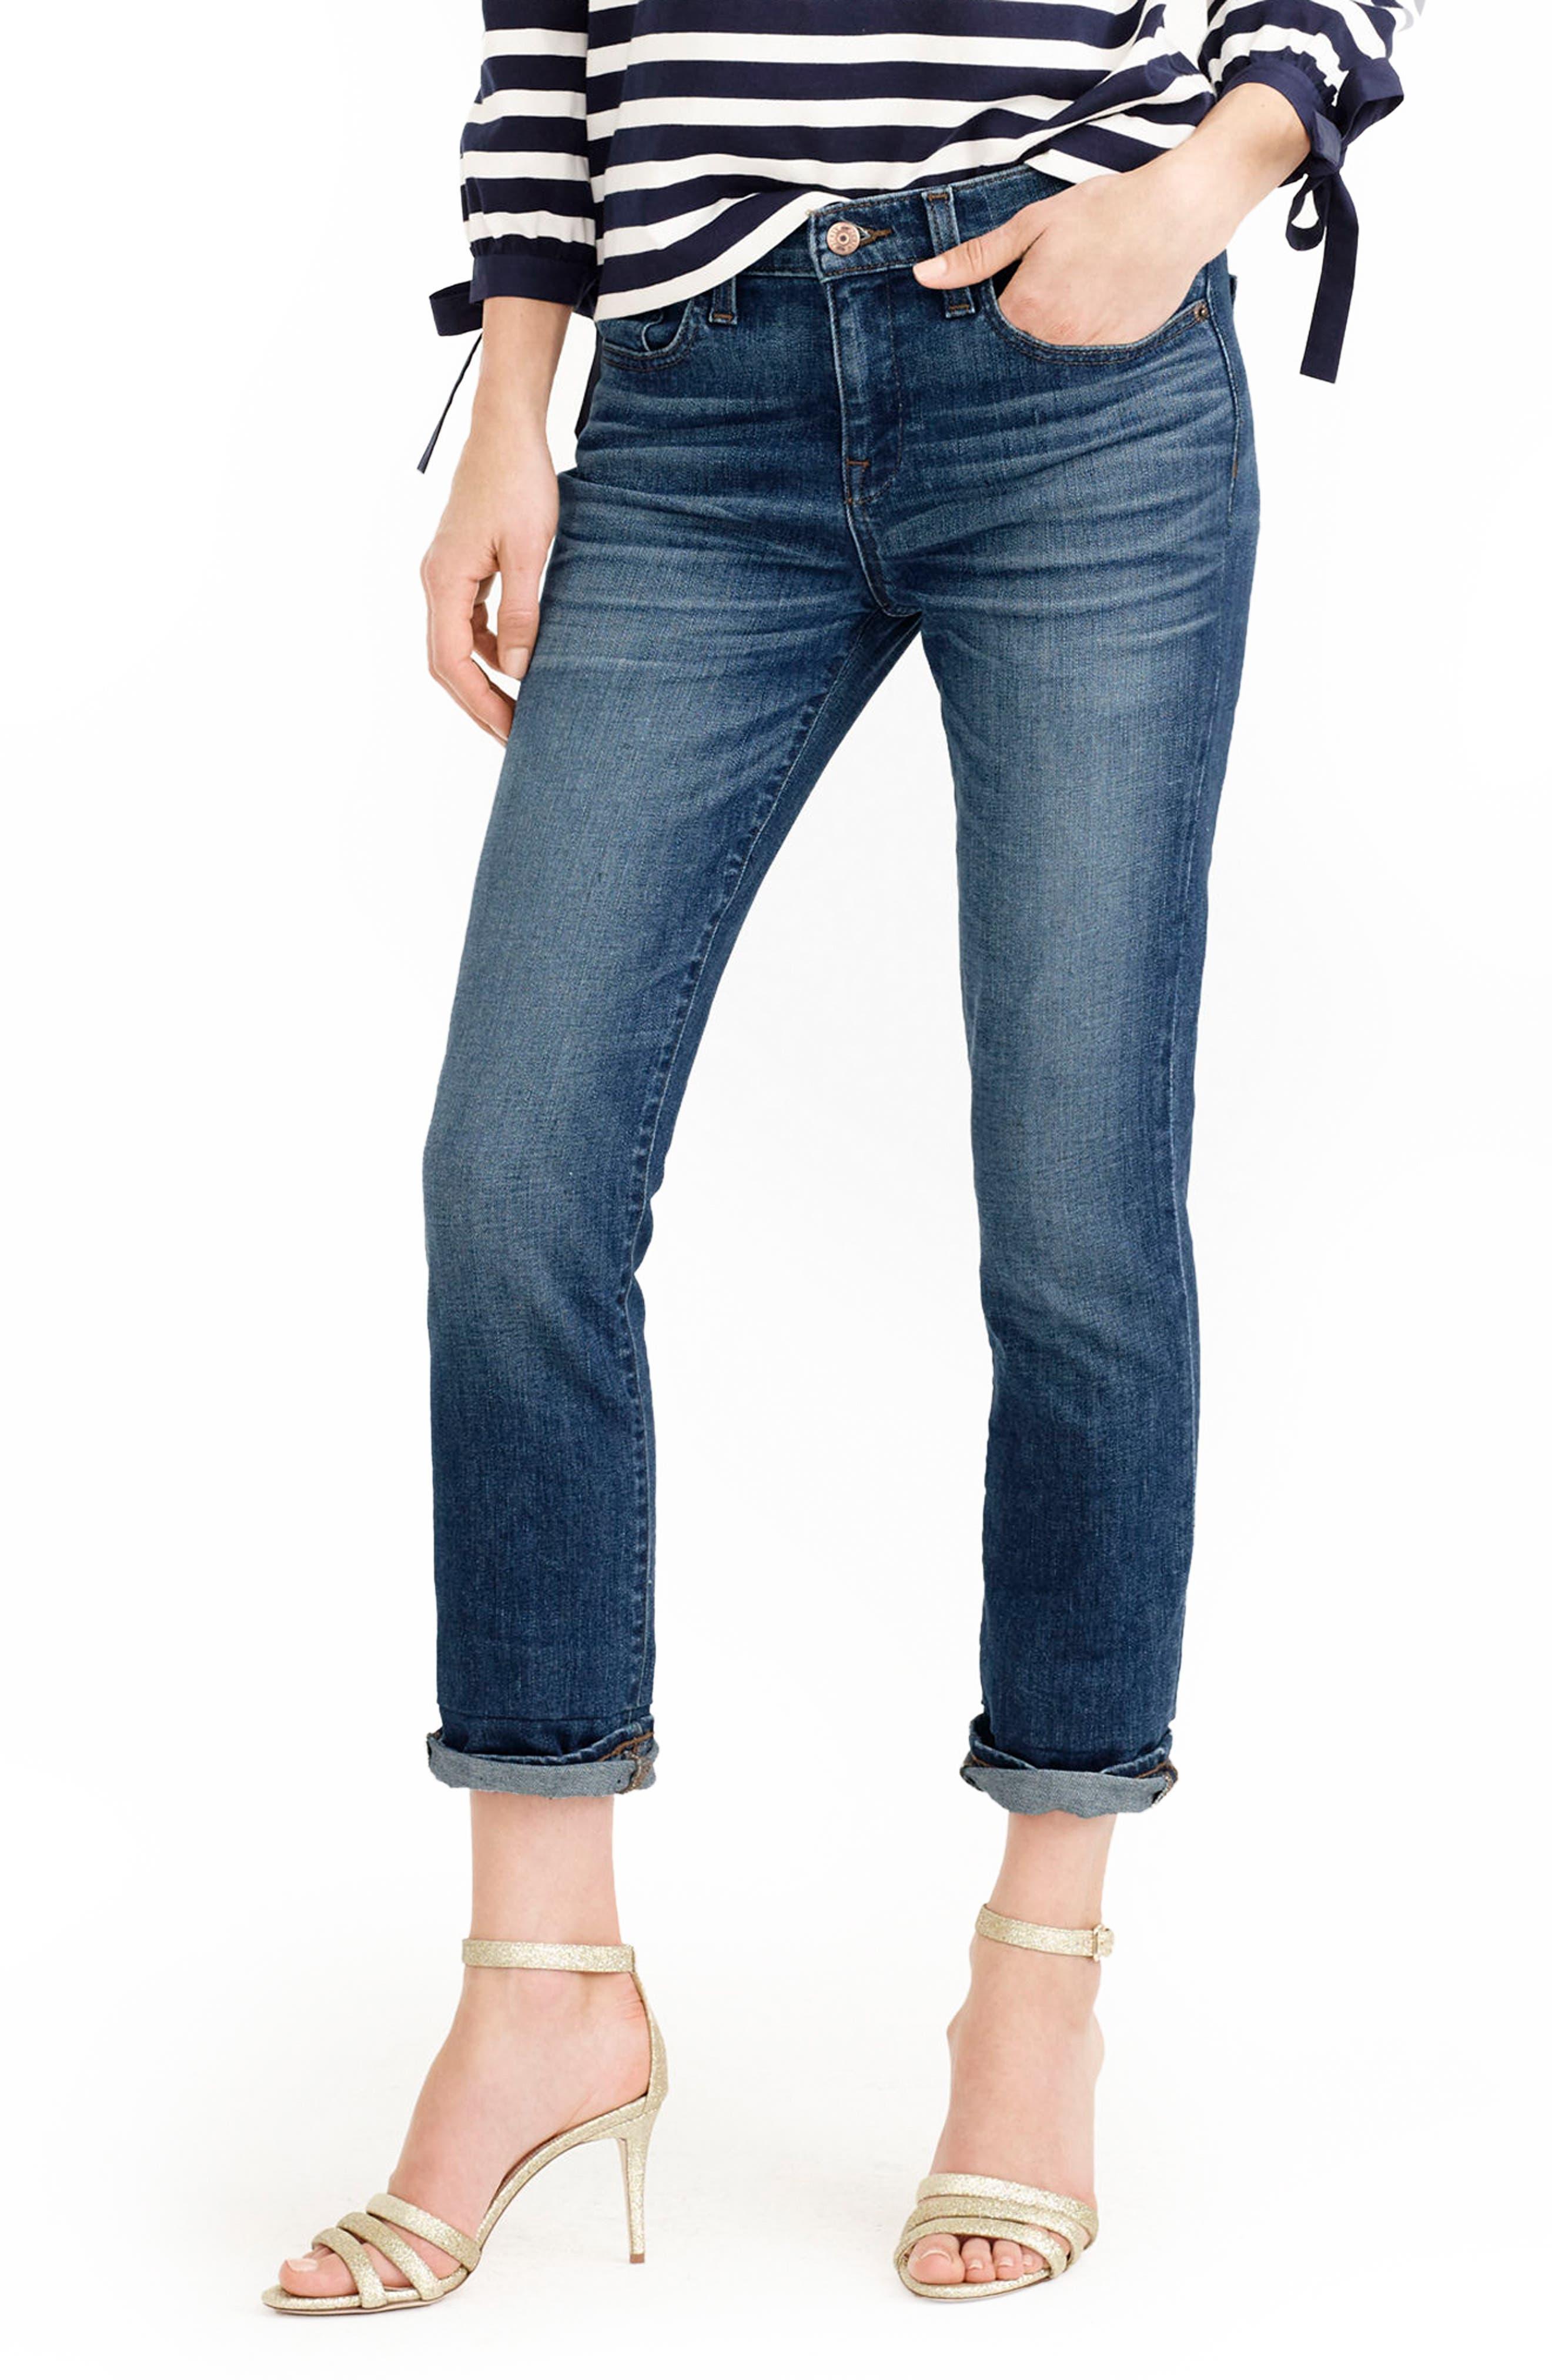 Alternate Image 1 Selected - J.Crew Slim Boyfriend Jeans (Wakefield) (Regular & Petite)